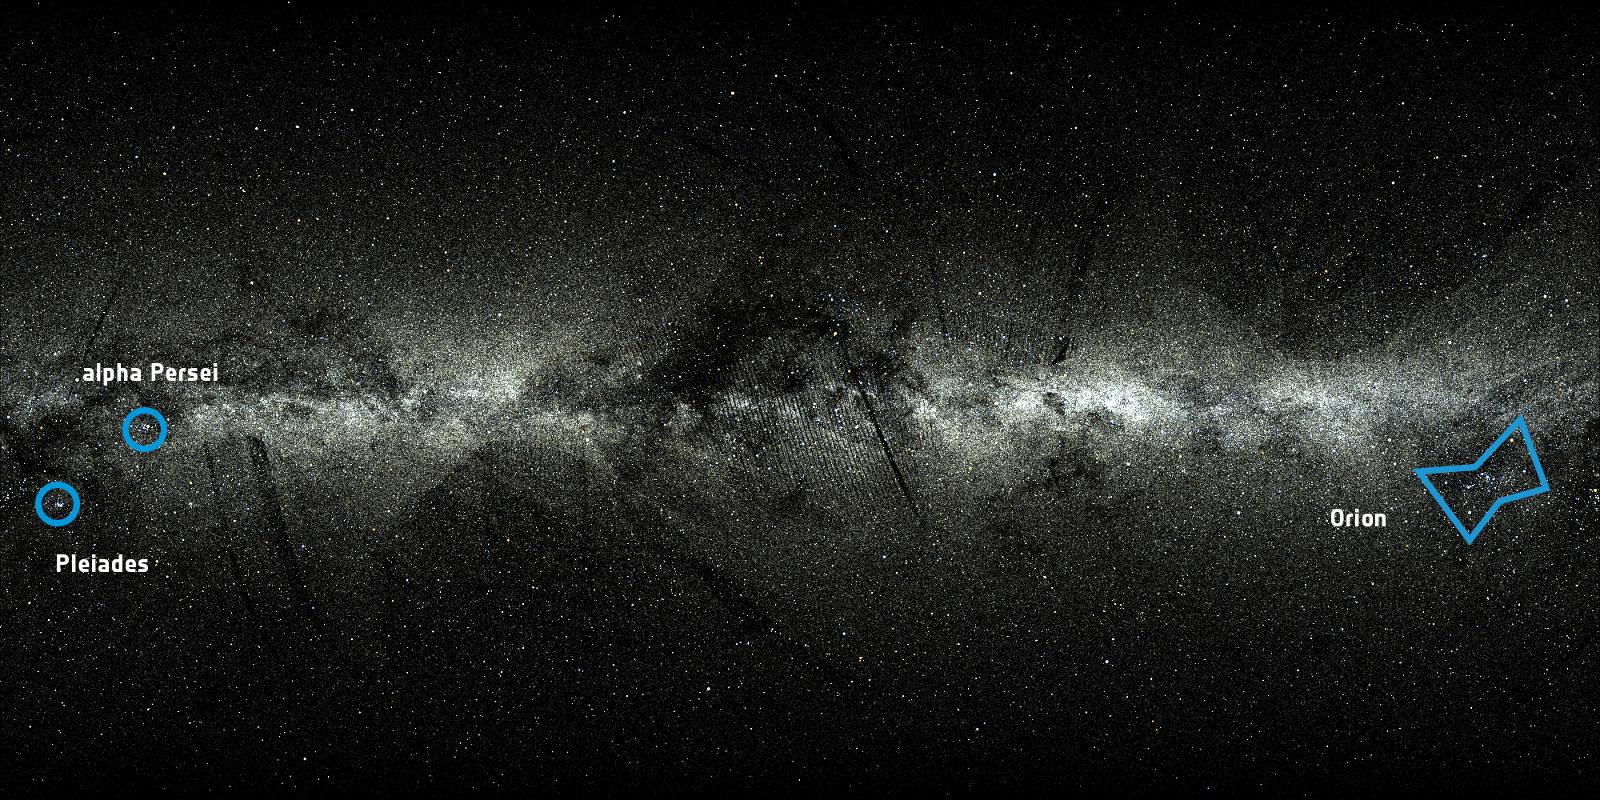 gaia spacecraft hd - photo #28